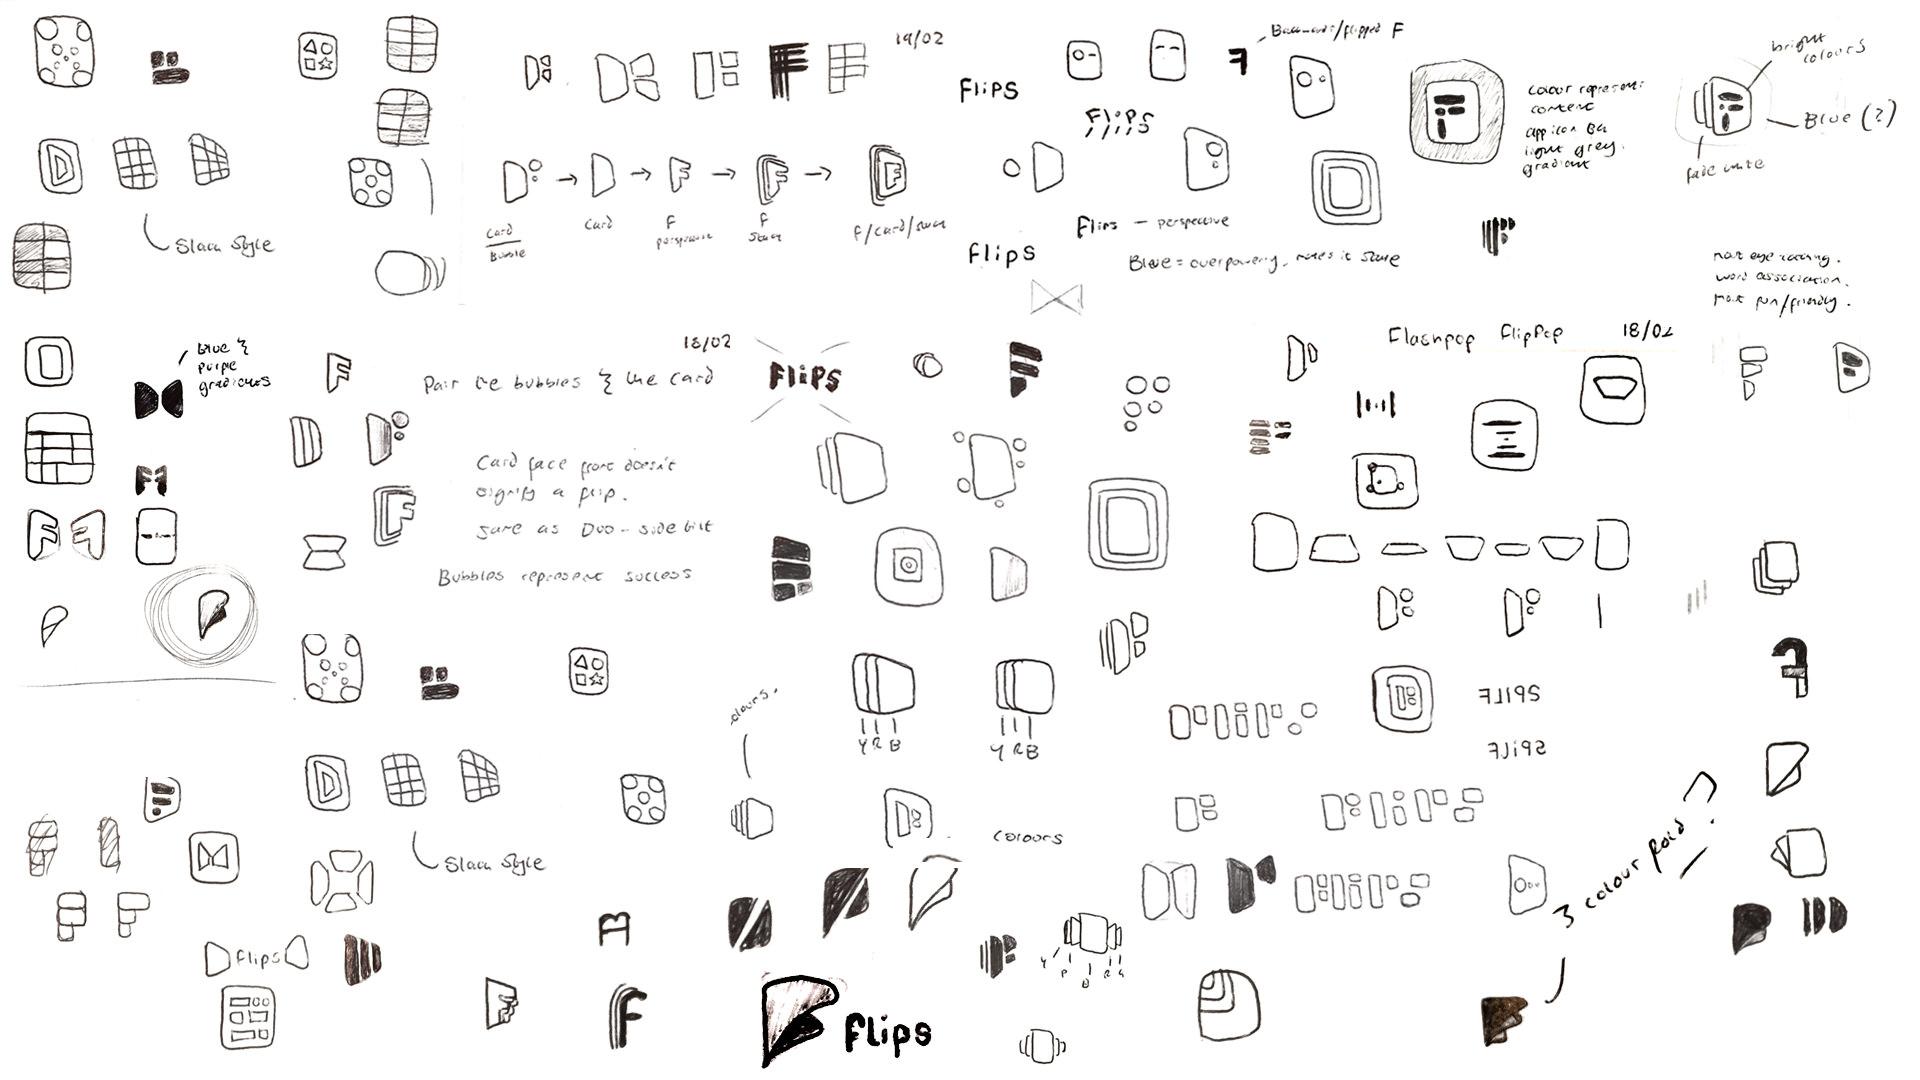 Duolingo Tinycards Flips Logo Sketches by Jack Morgan